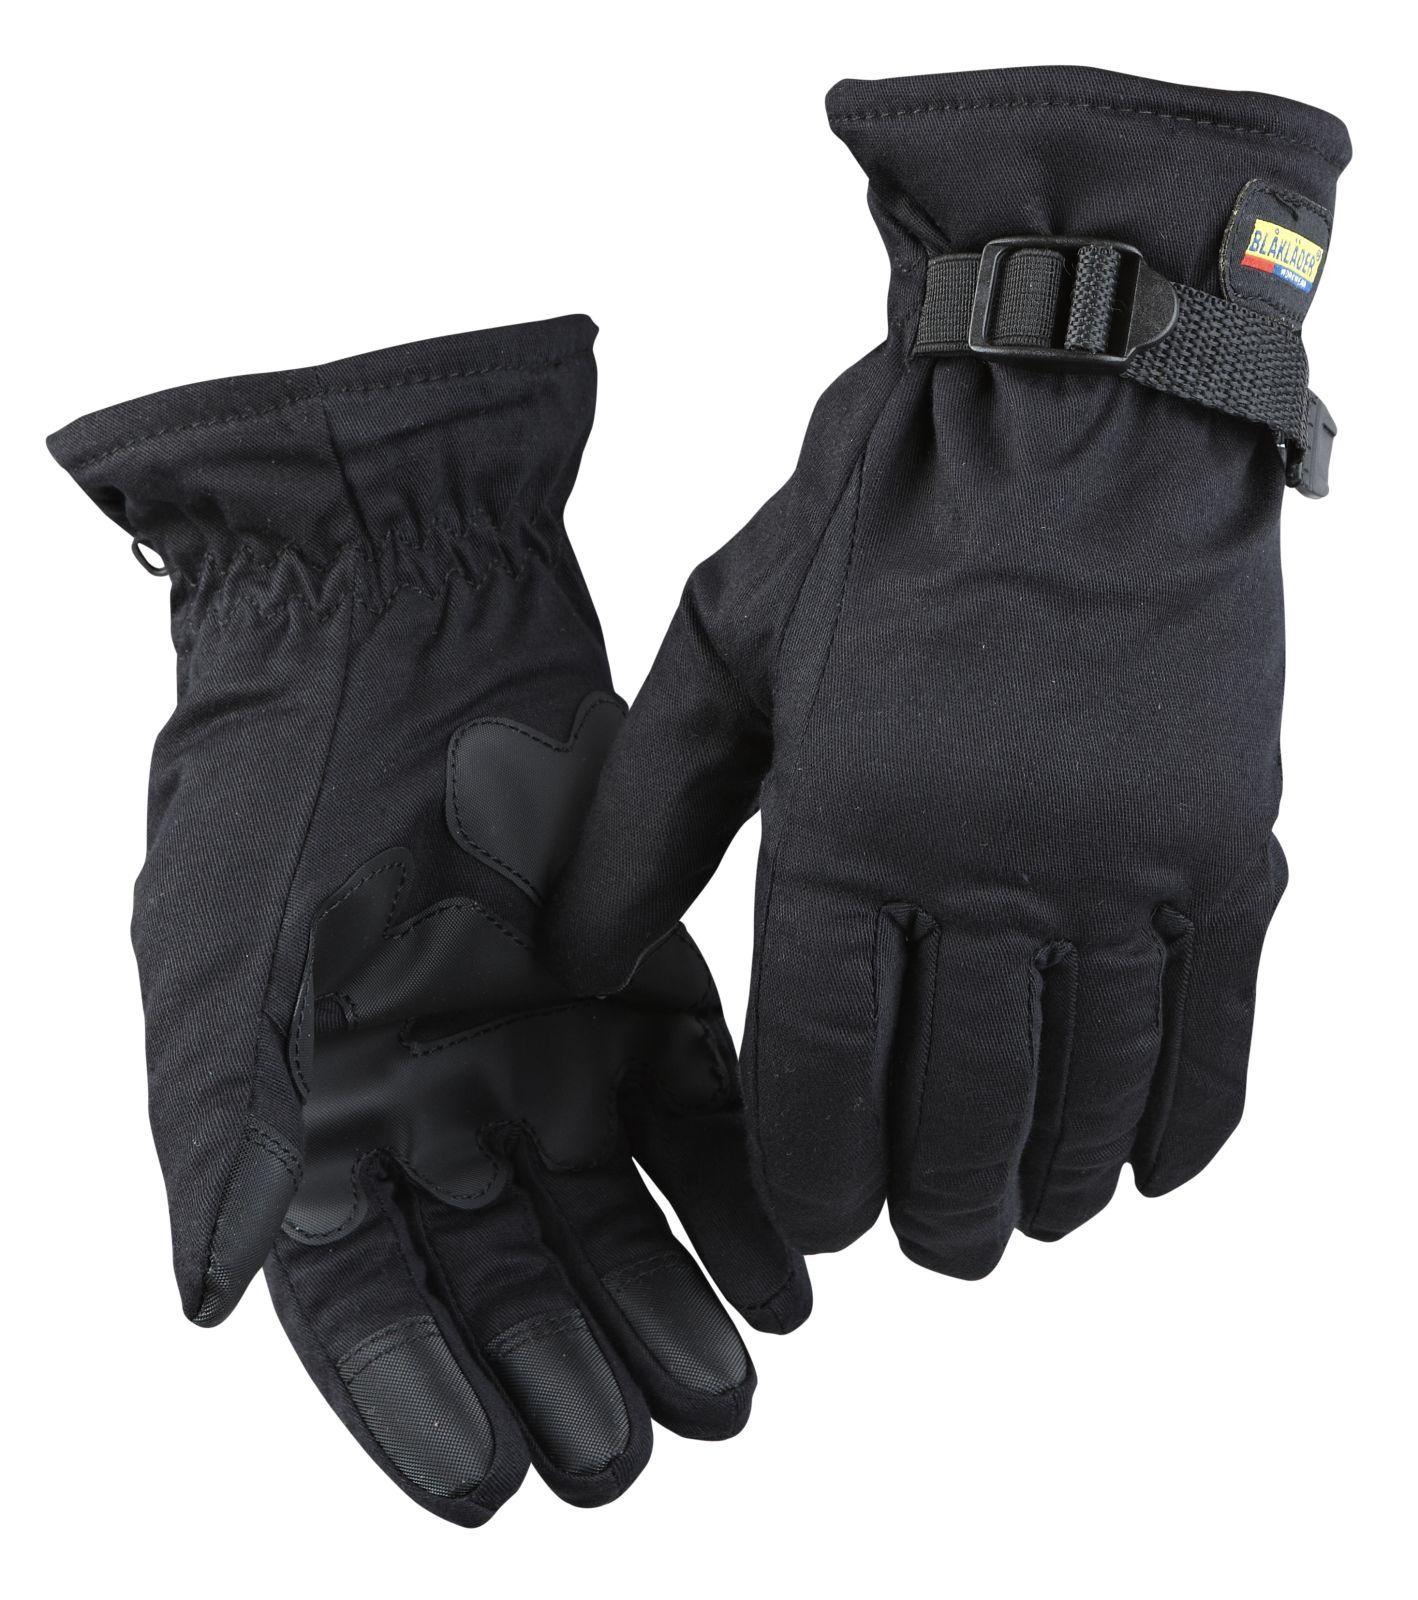 Blaklader Handschoenen 22373921 zwart(9900)